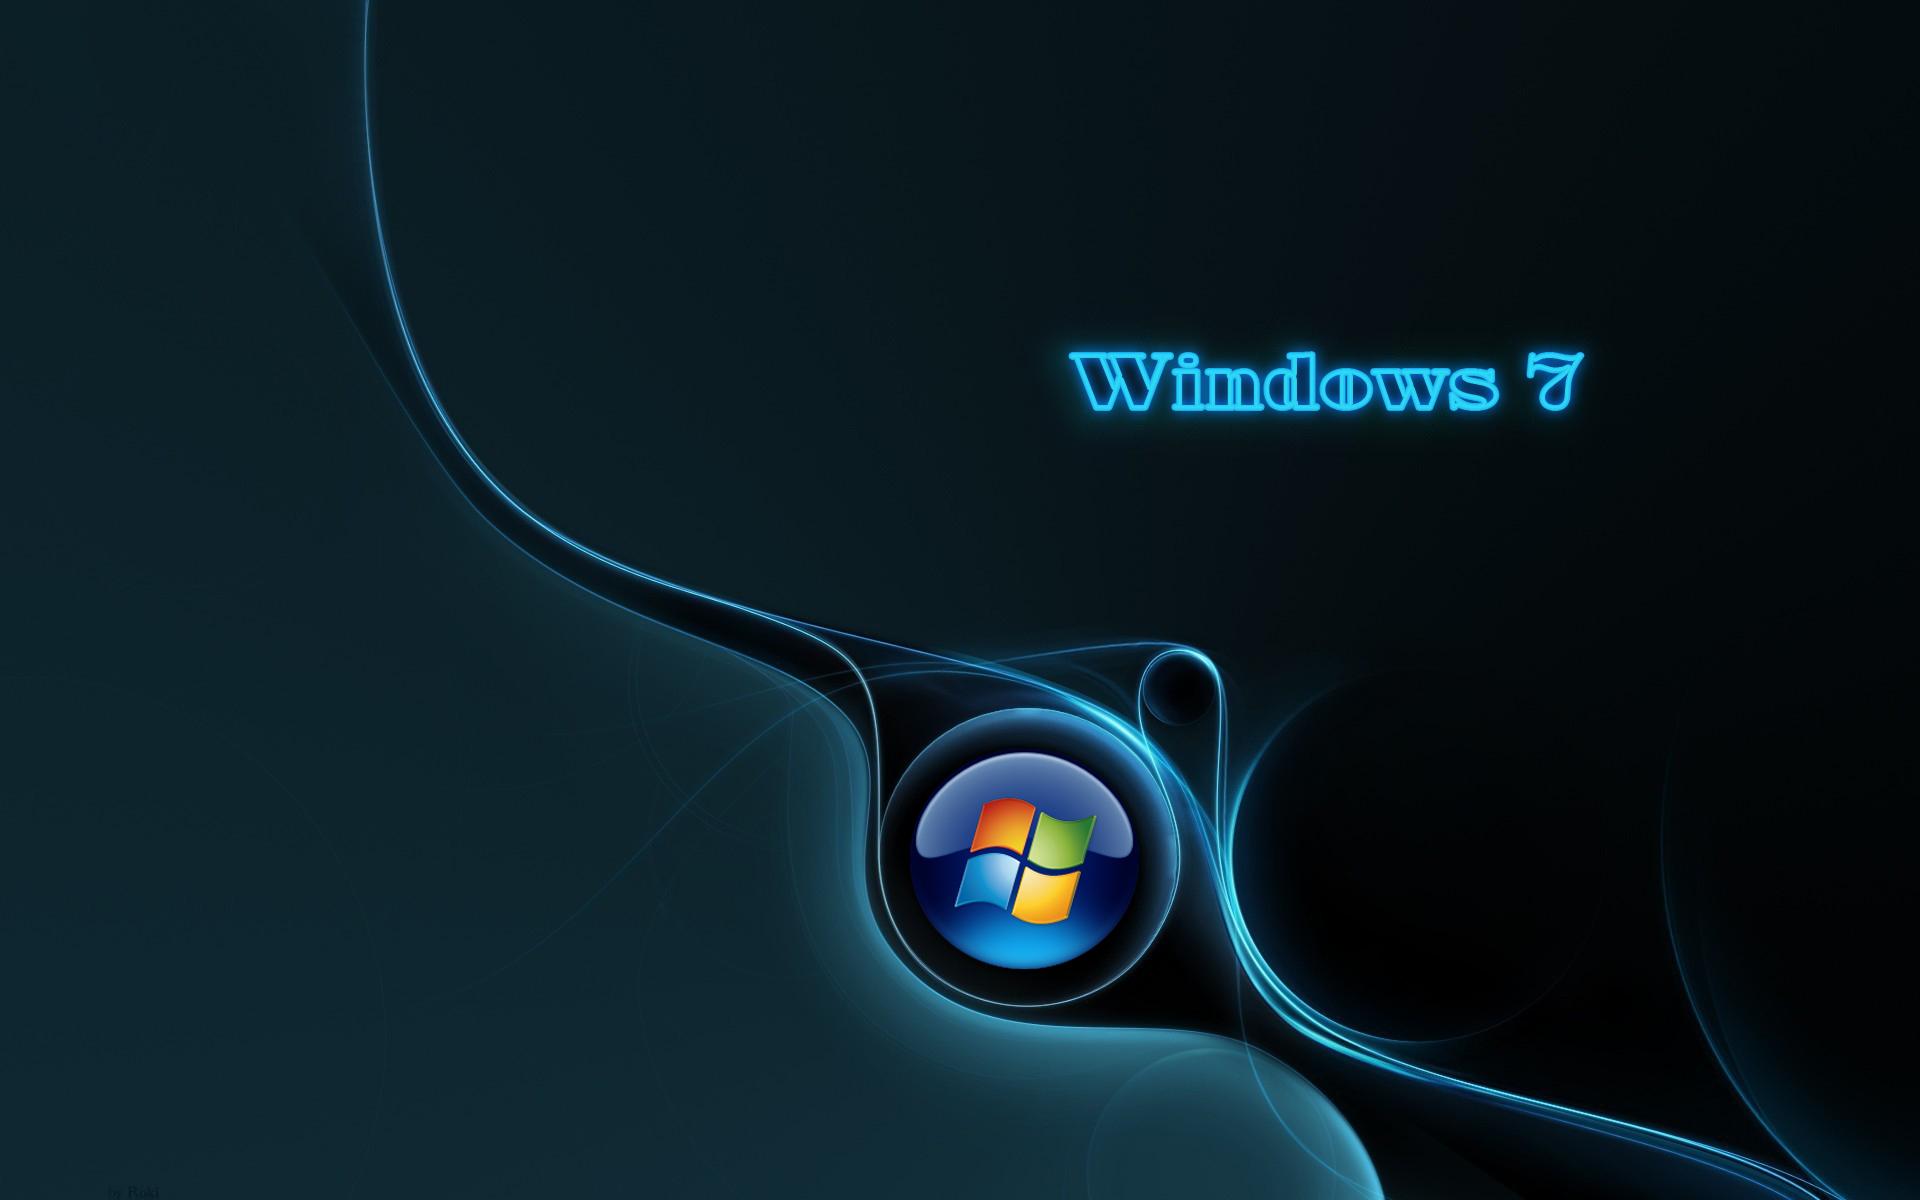 Windows 7 Wallpaper By Kubines On DeviantArt